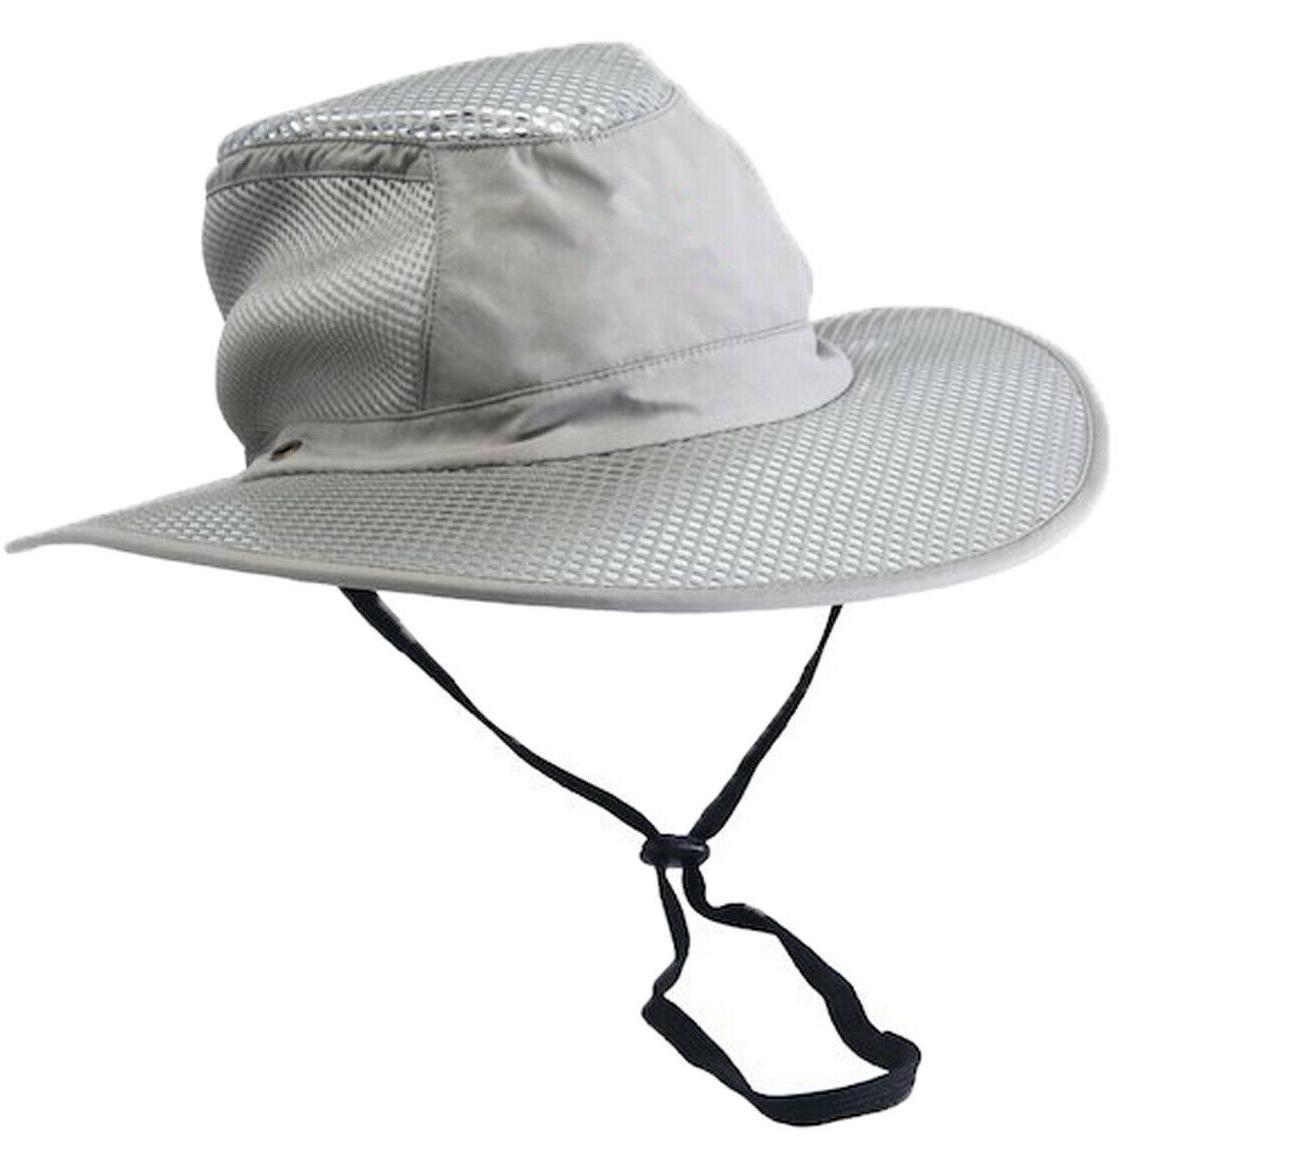 Polar Hydro Evaporative Hat UV Reflective Protection Bucket Solar